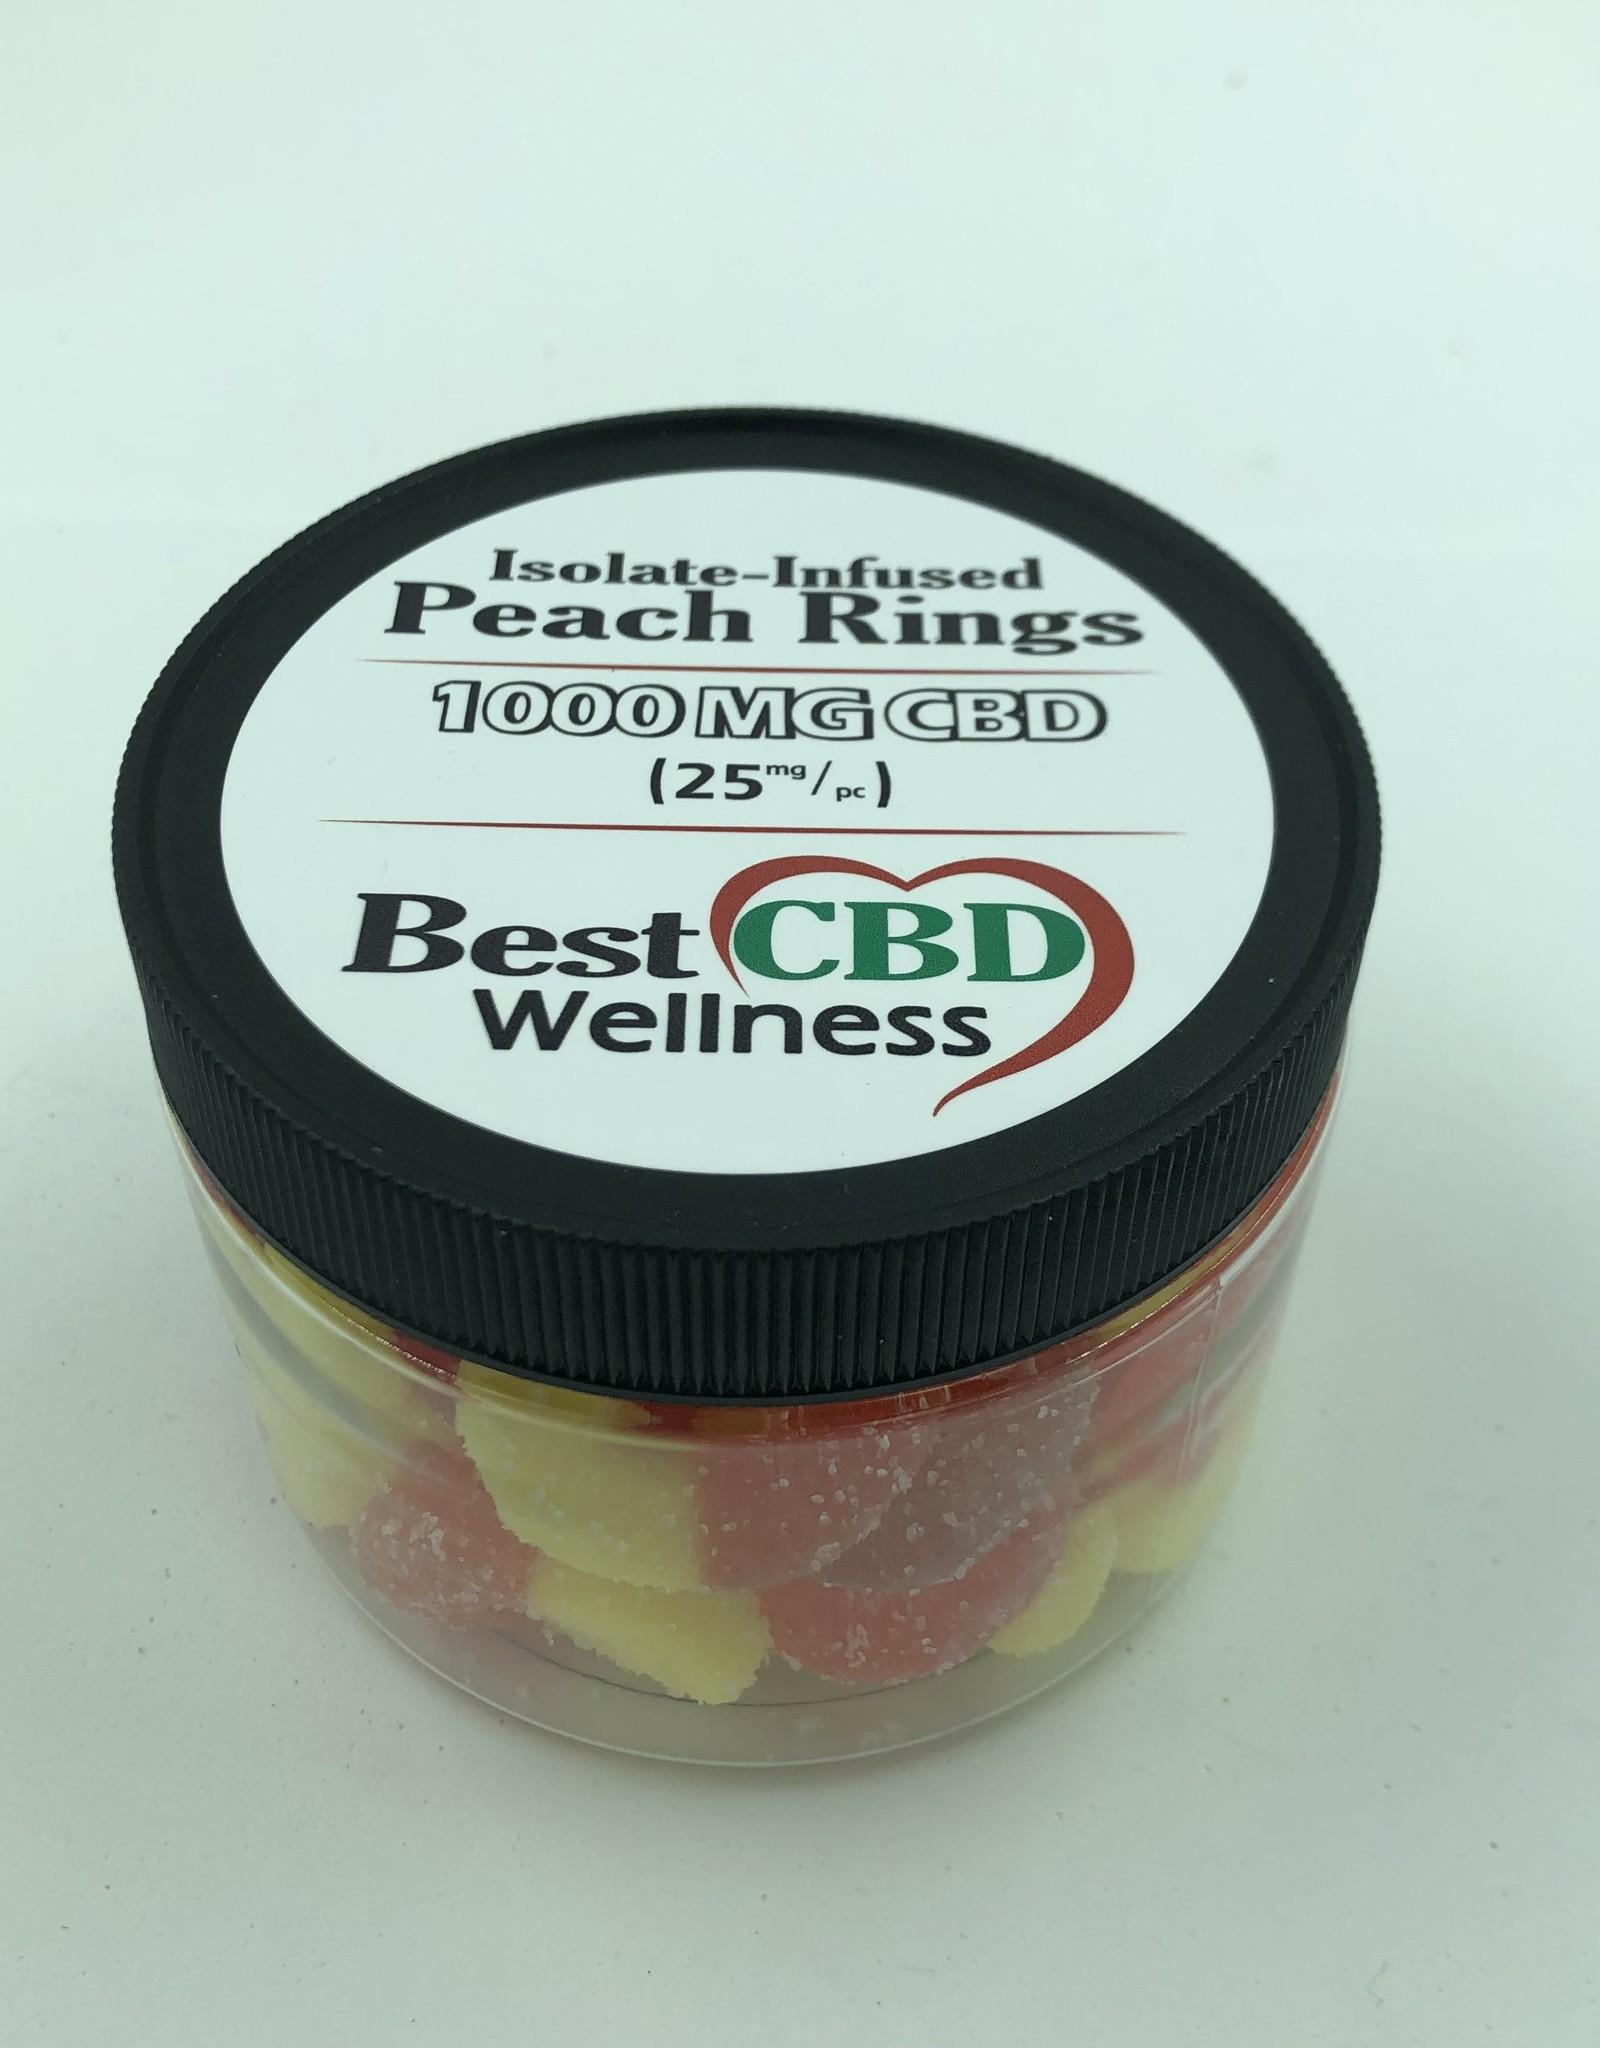 Best CBD Wellness Isolate CBD Peach Rings 1000mg 40 pc/25mg ea